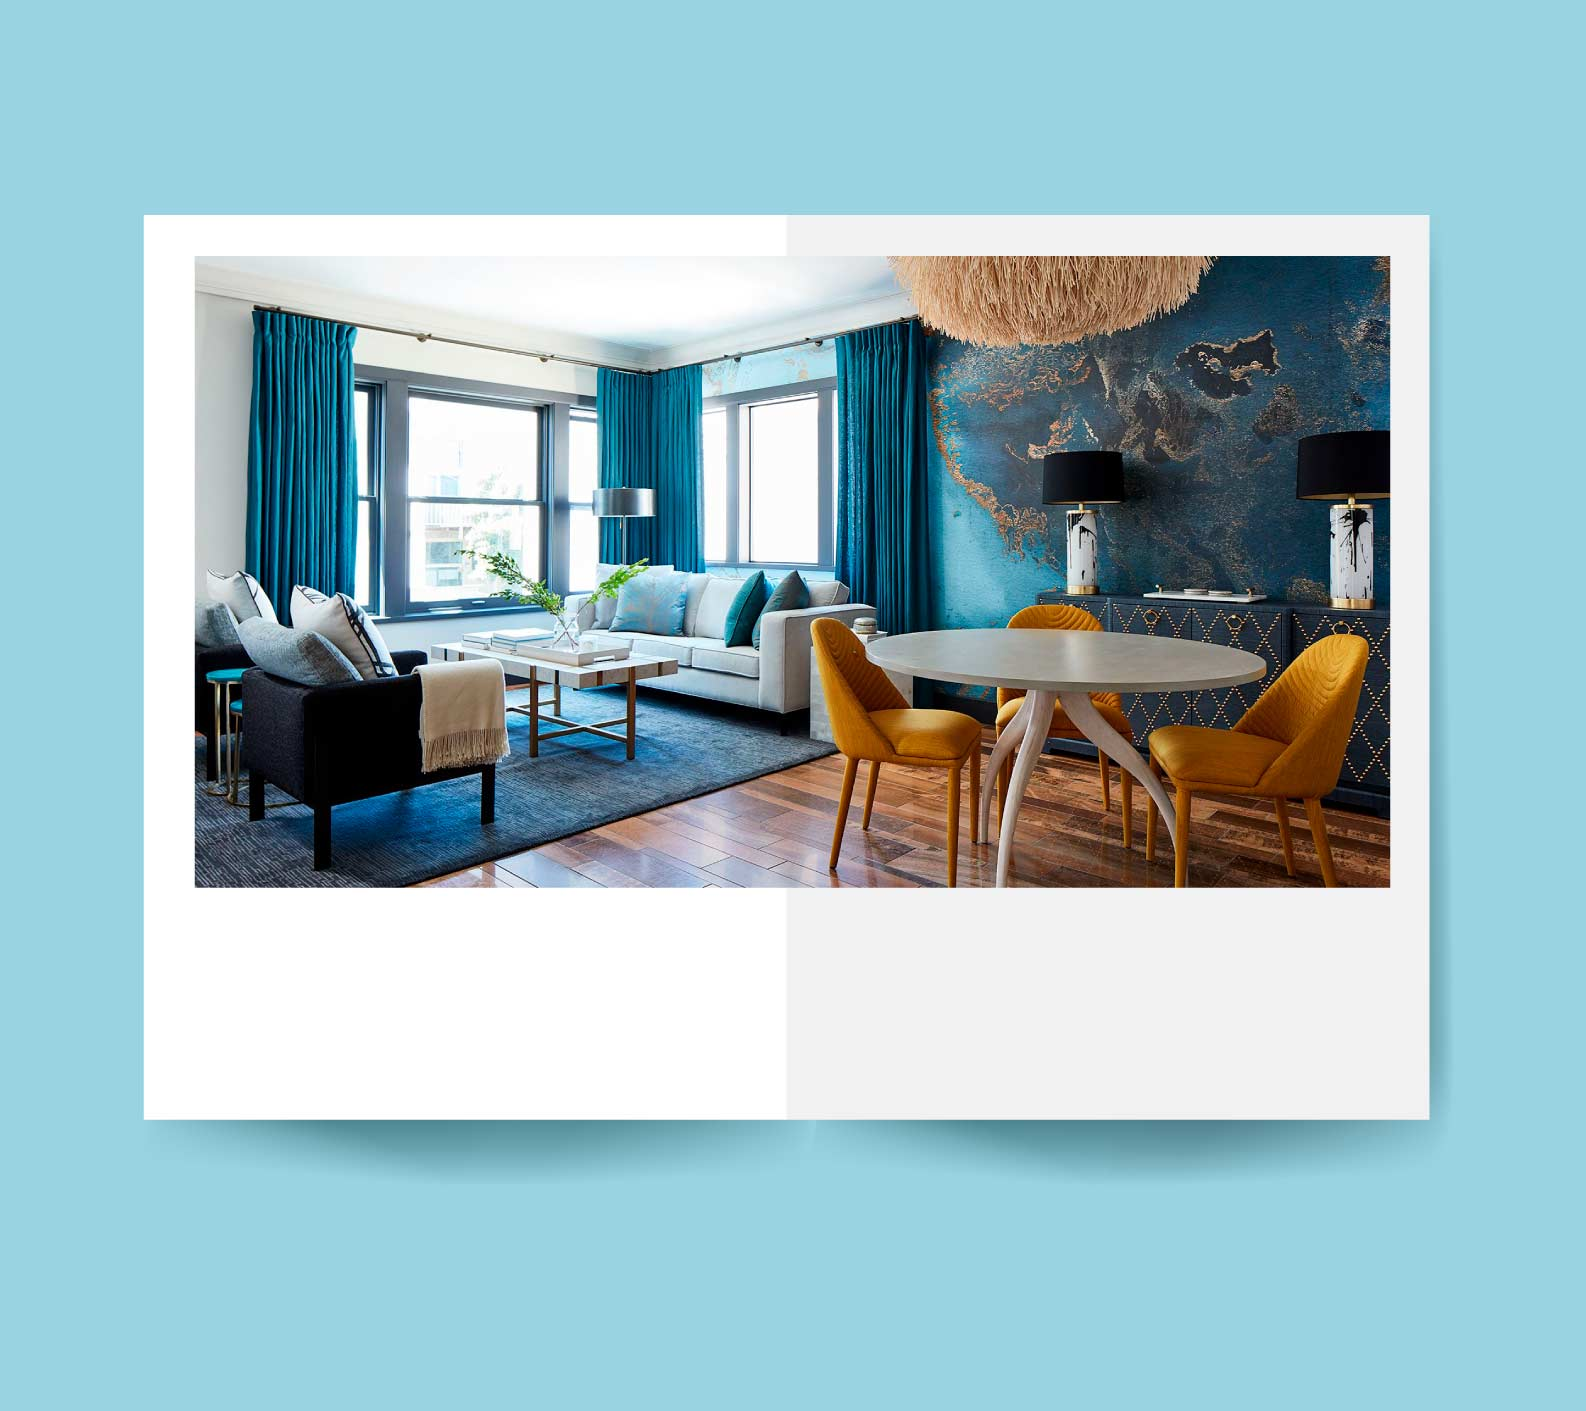 diffrent interior design - معرفی شغل طراح داخلی